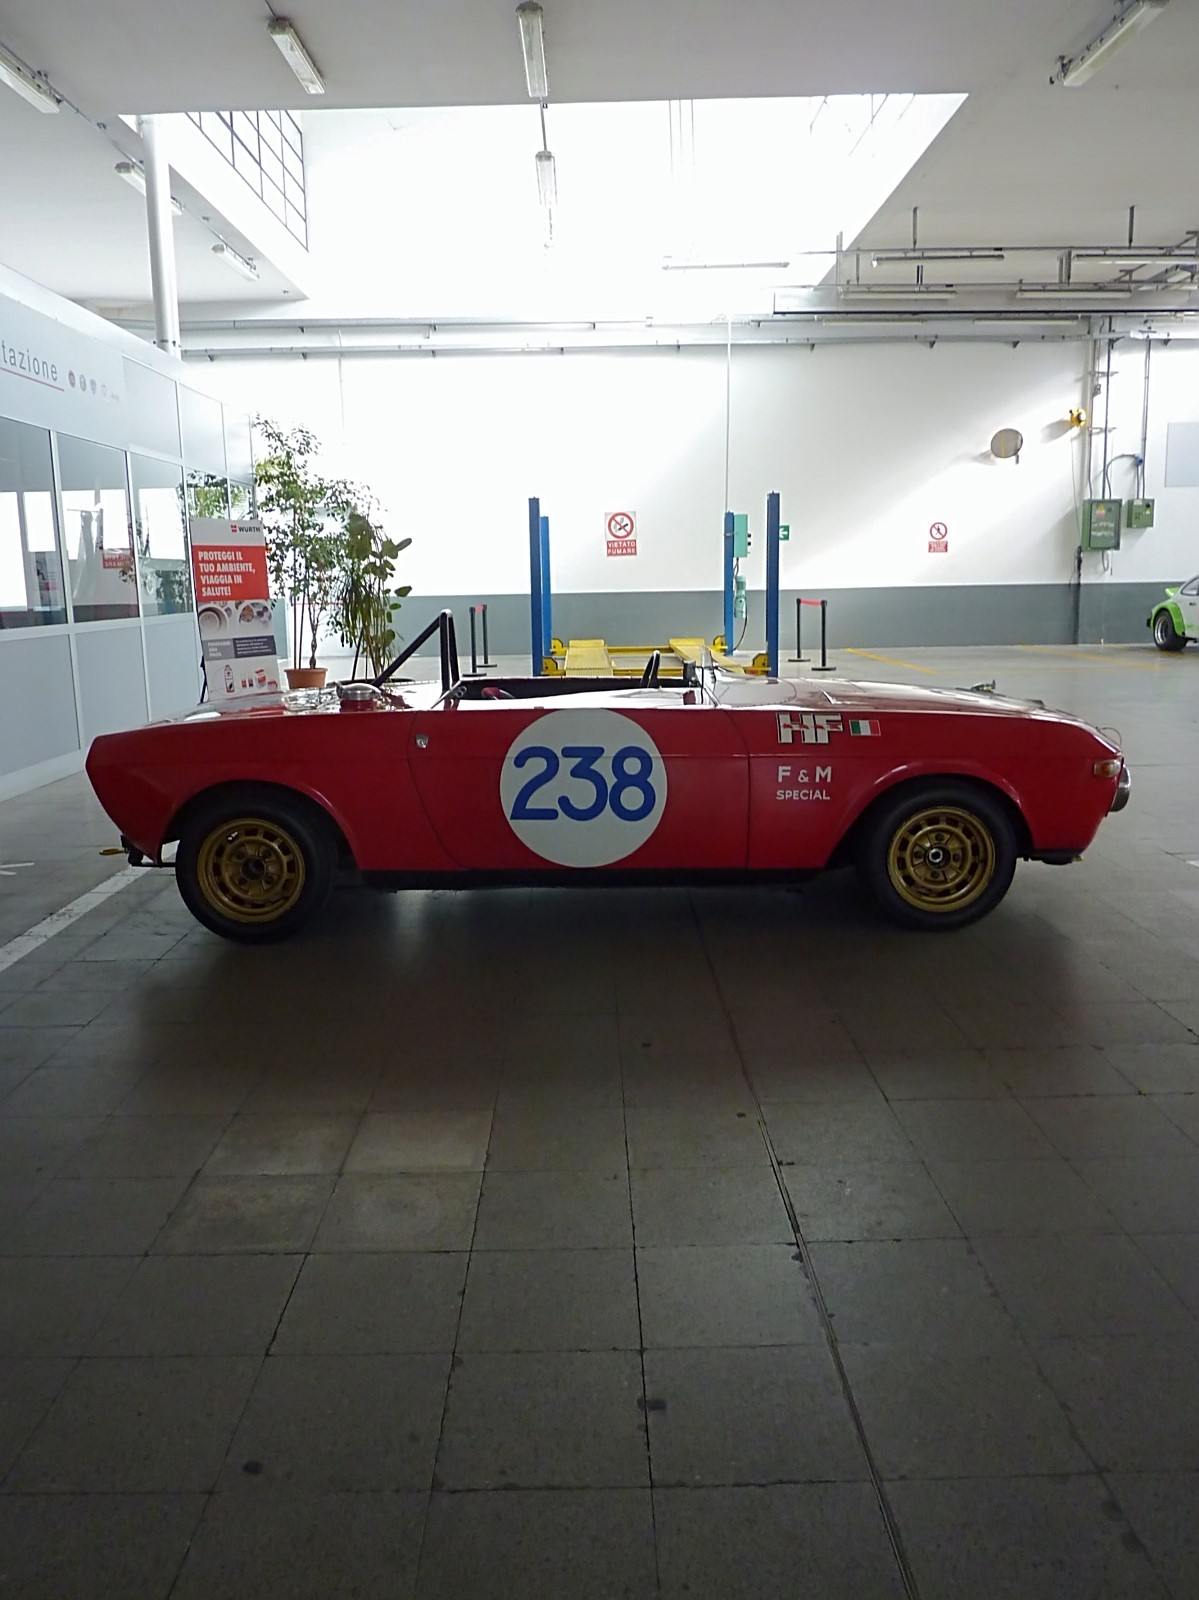 1969 Lancia Fulvia HF Barchetta F&M (Sandro  Munari) (6)